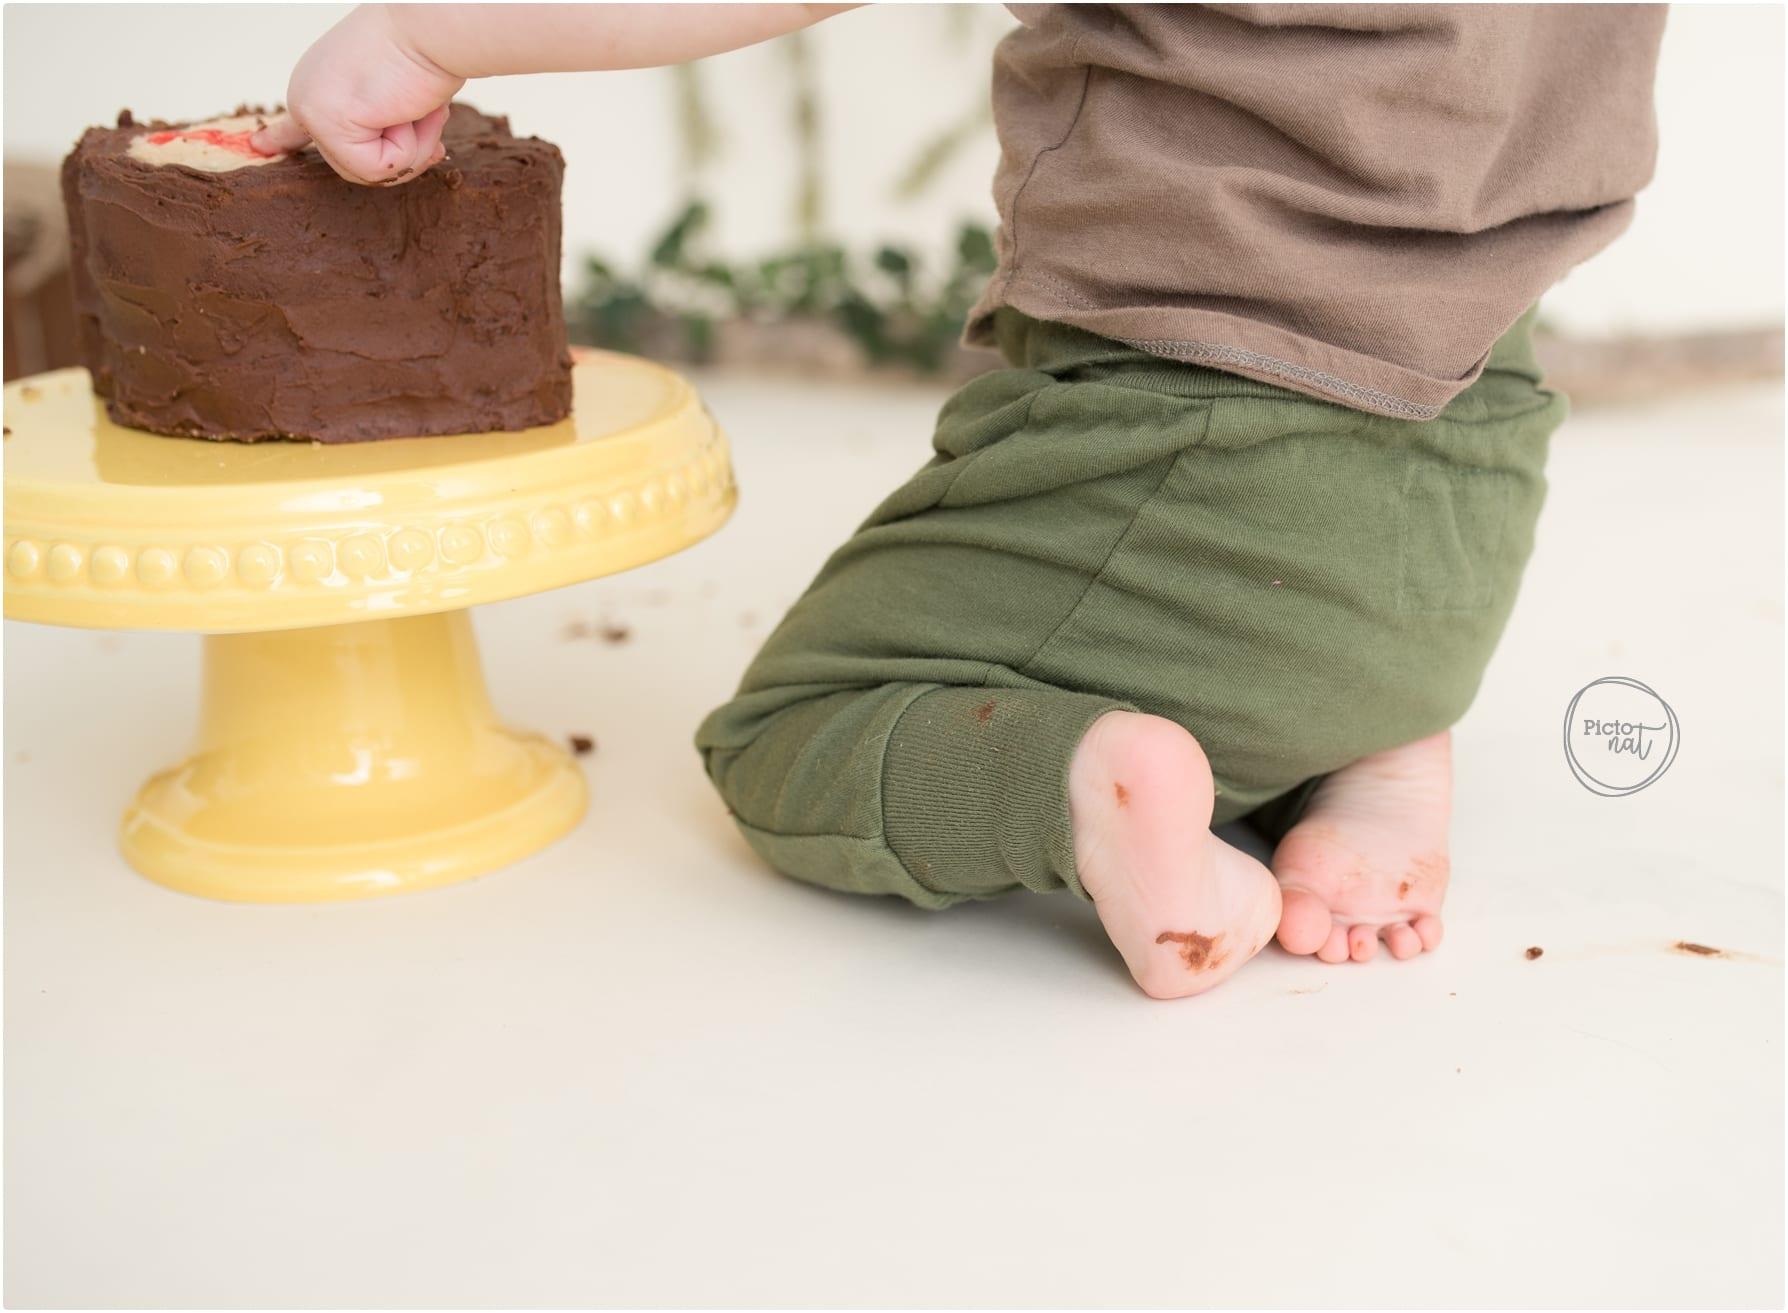 Cake smash toronto with Pictonat Photography